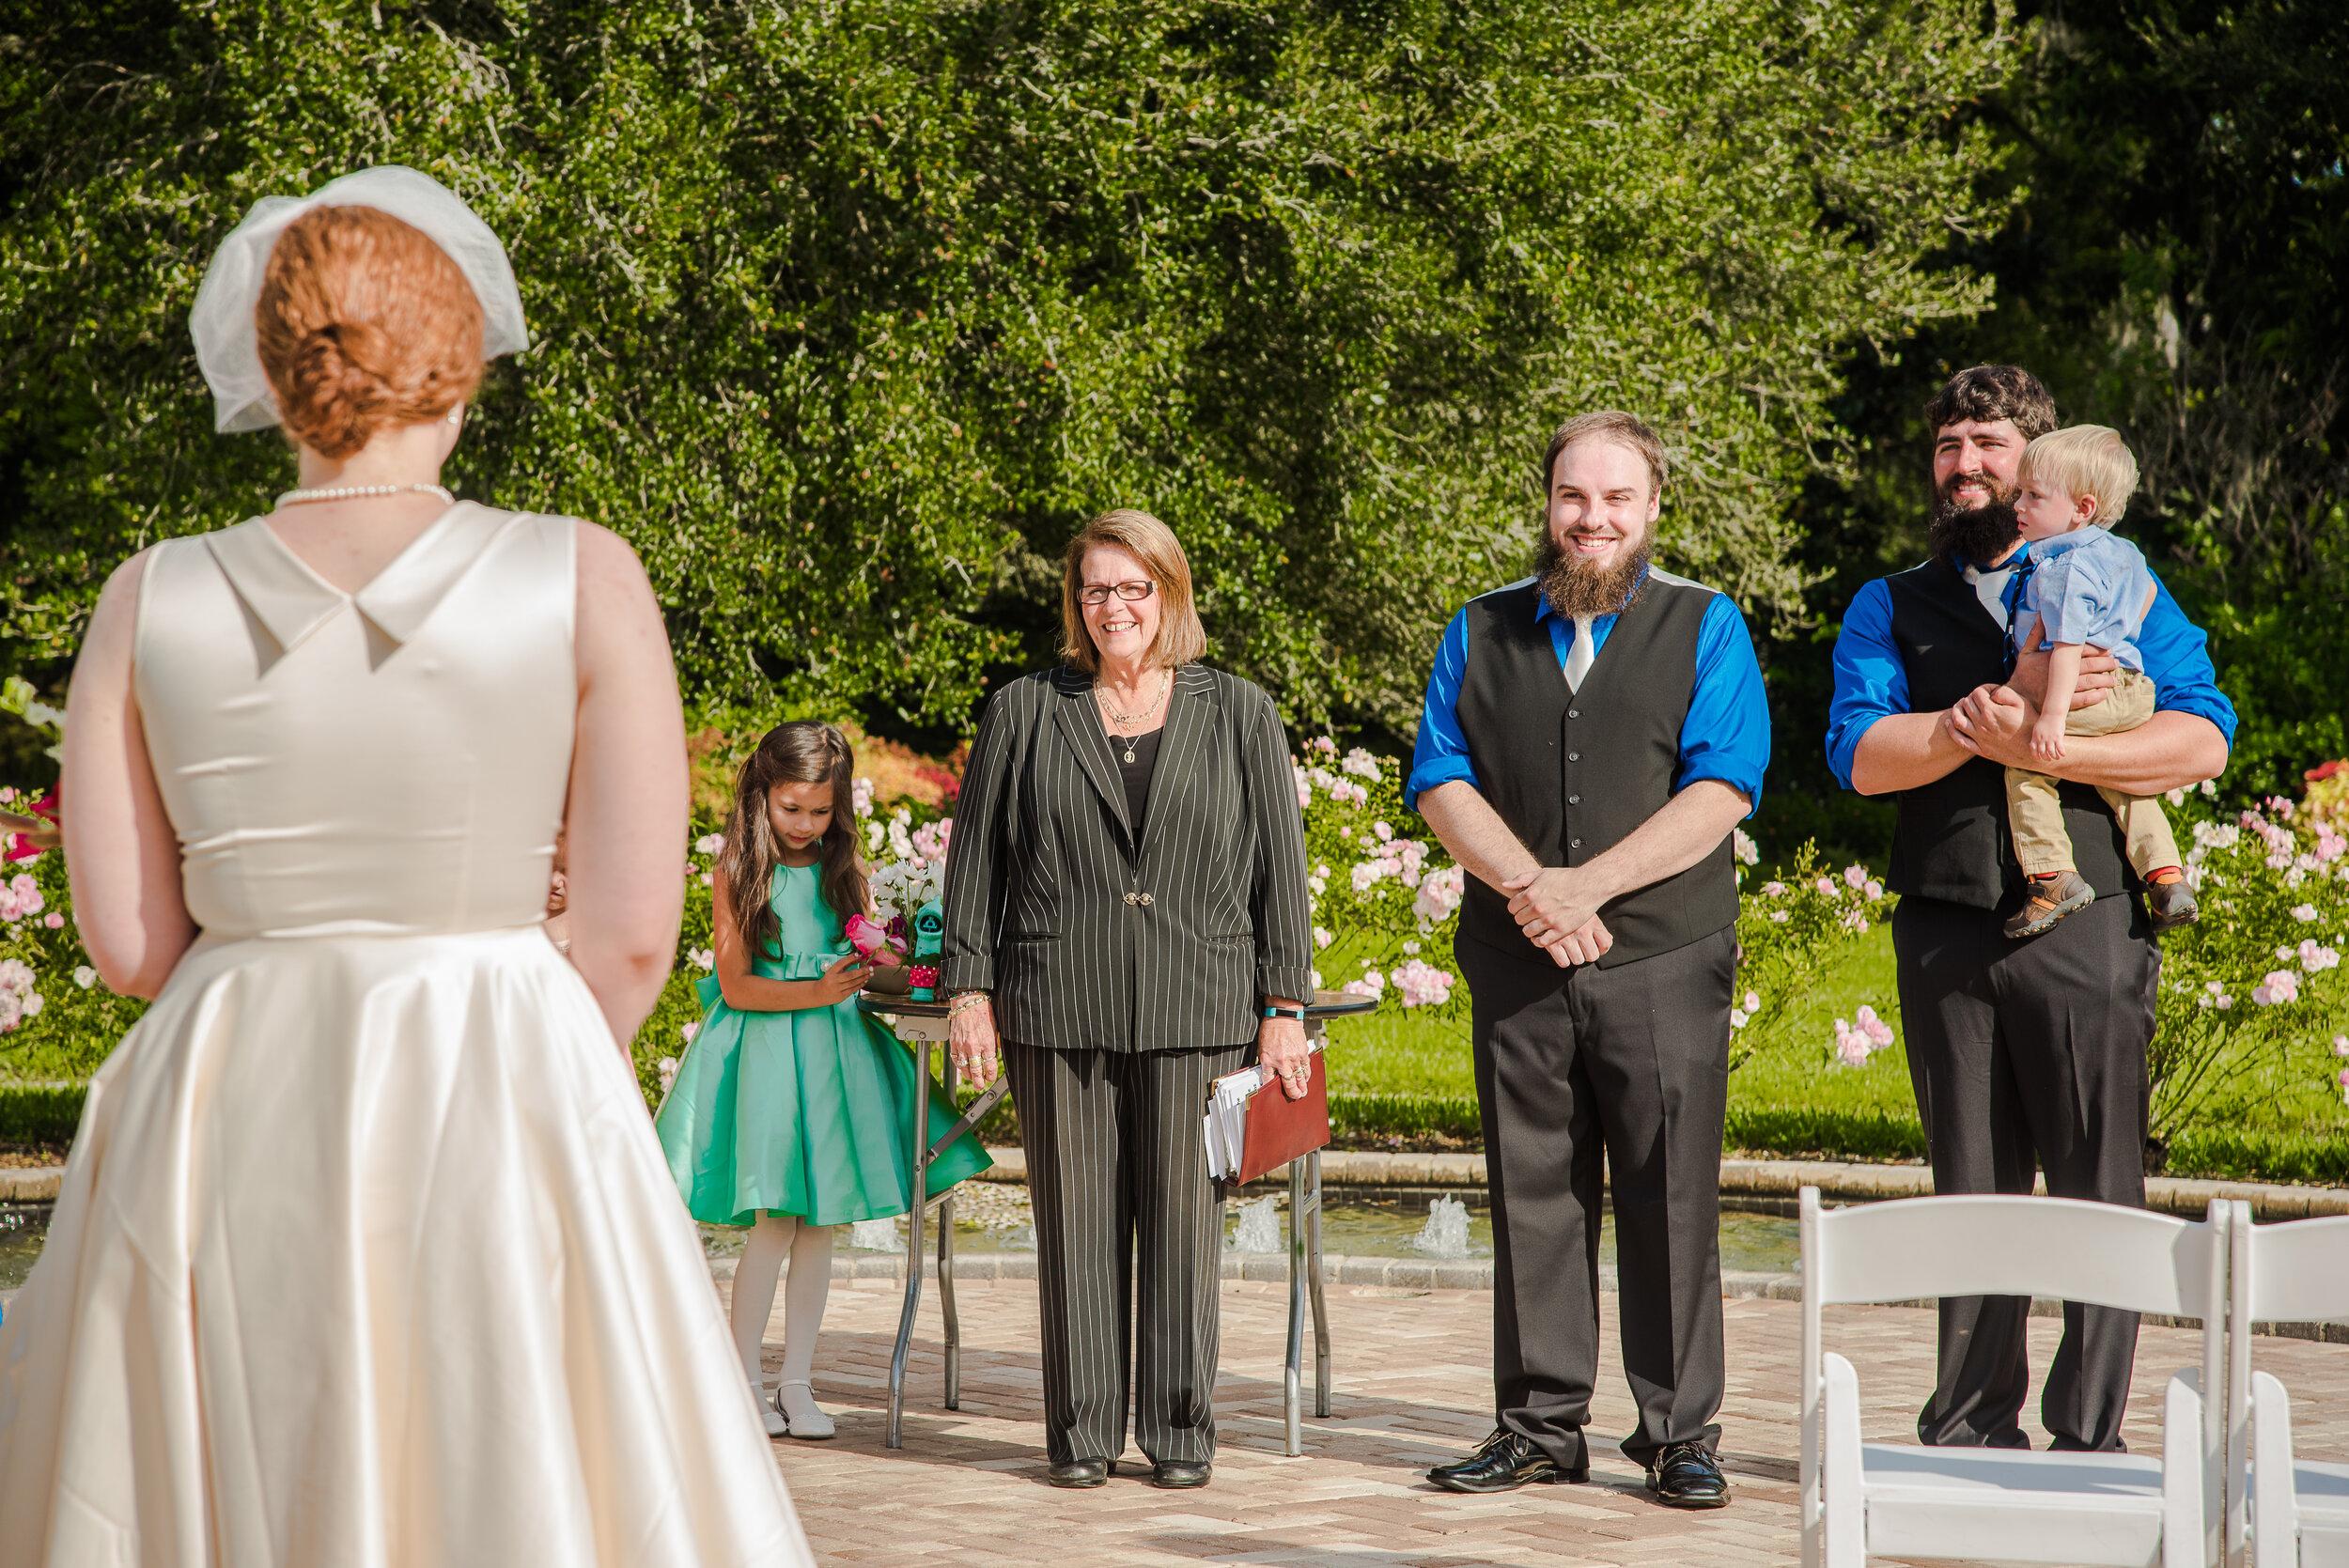 herry-garden-wedding-1-46.jpg